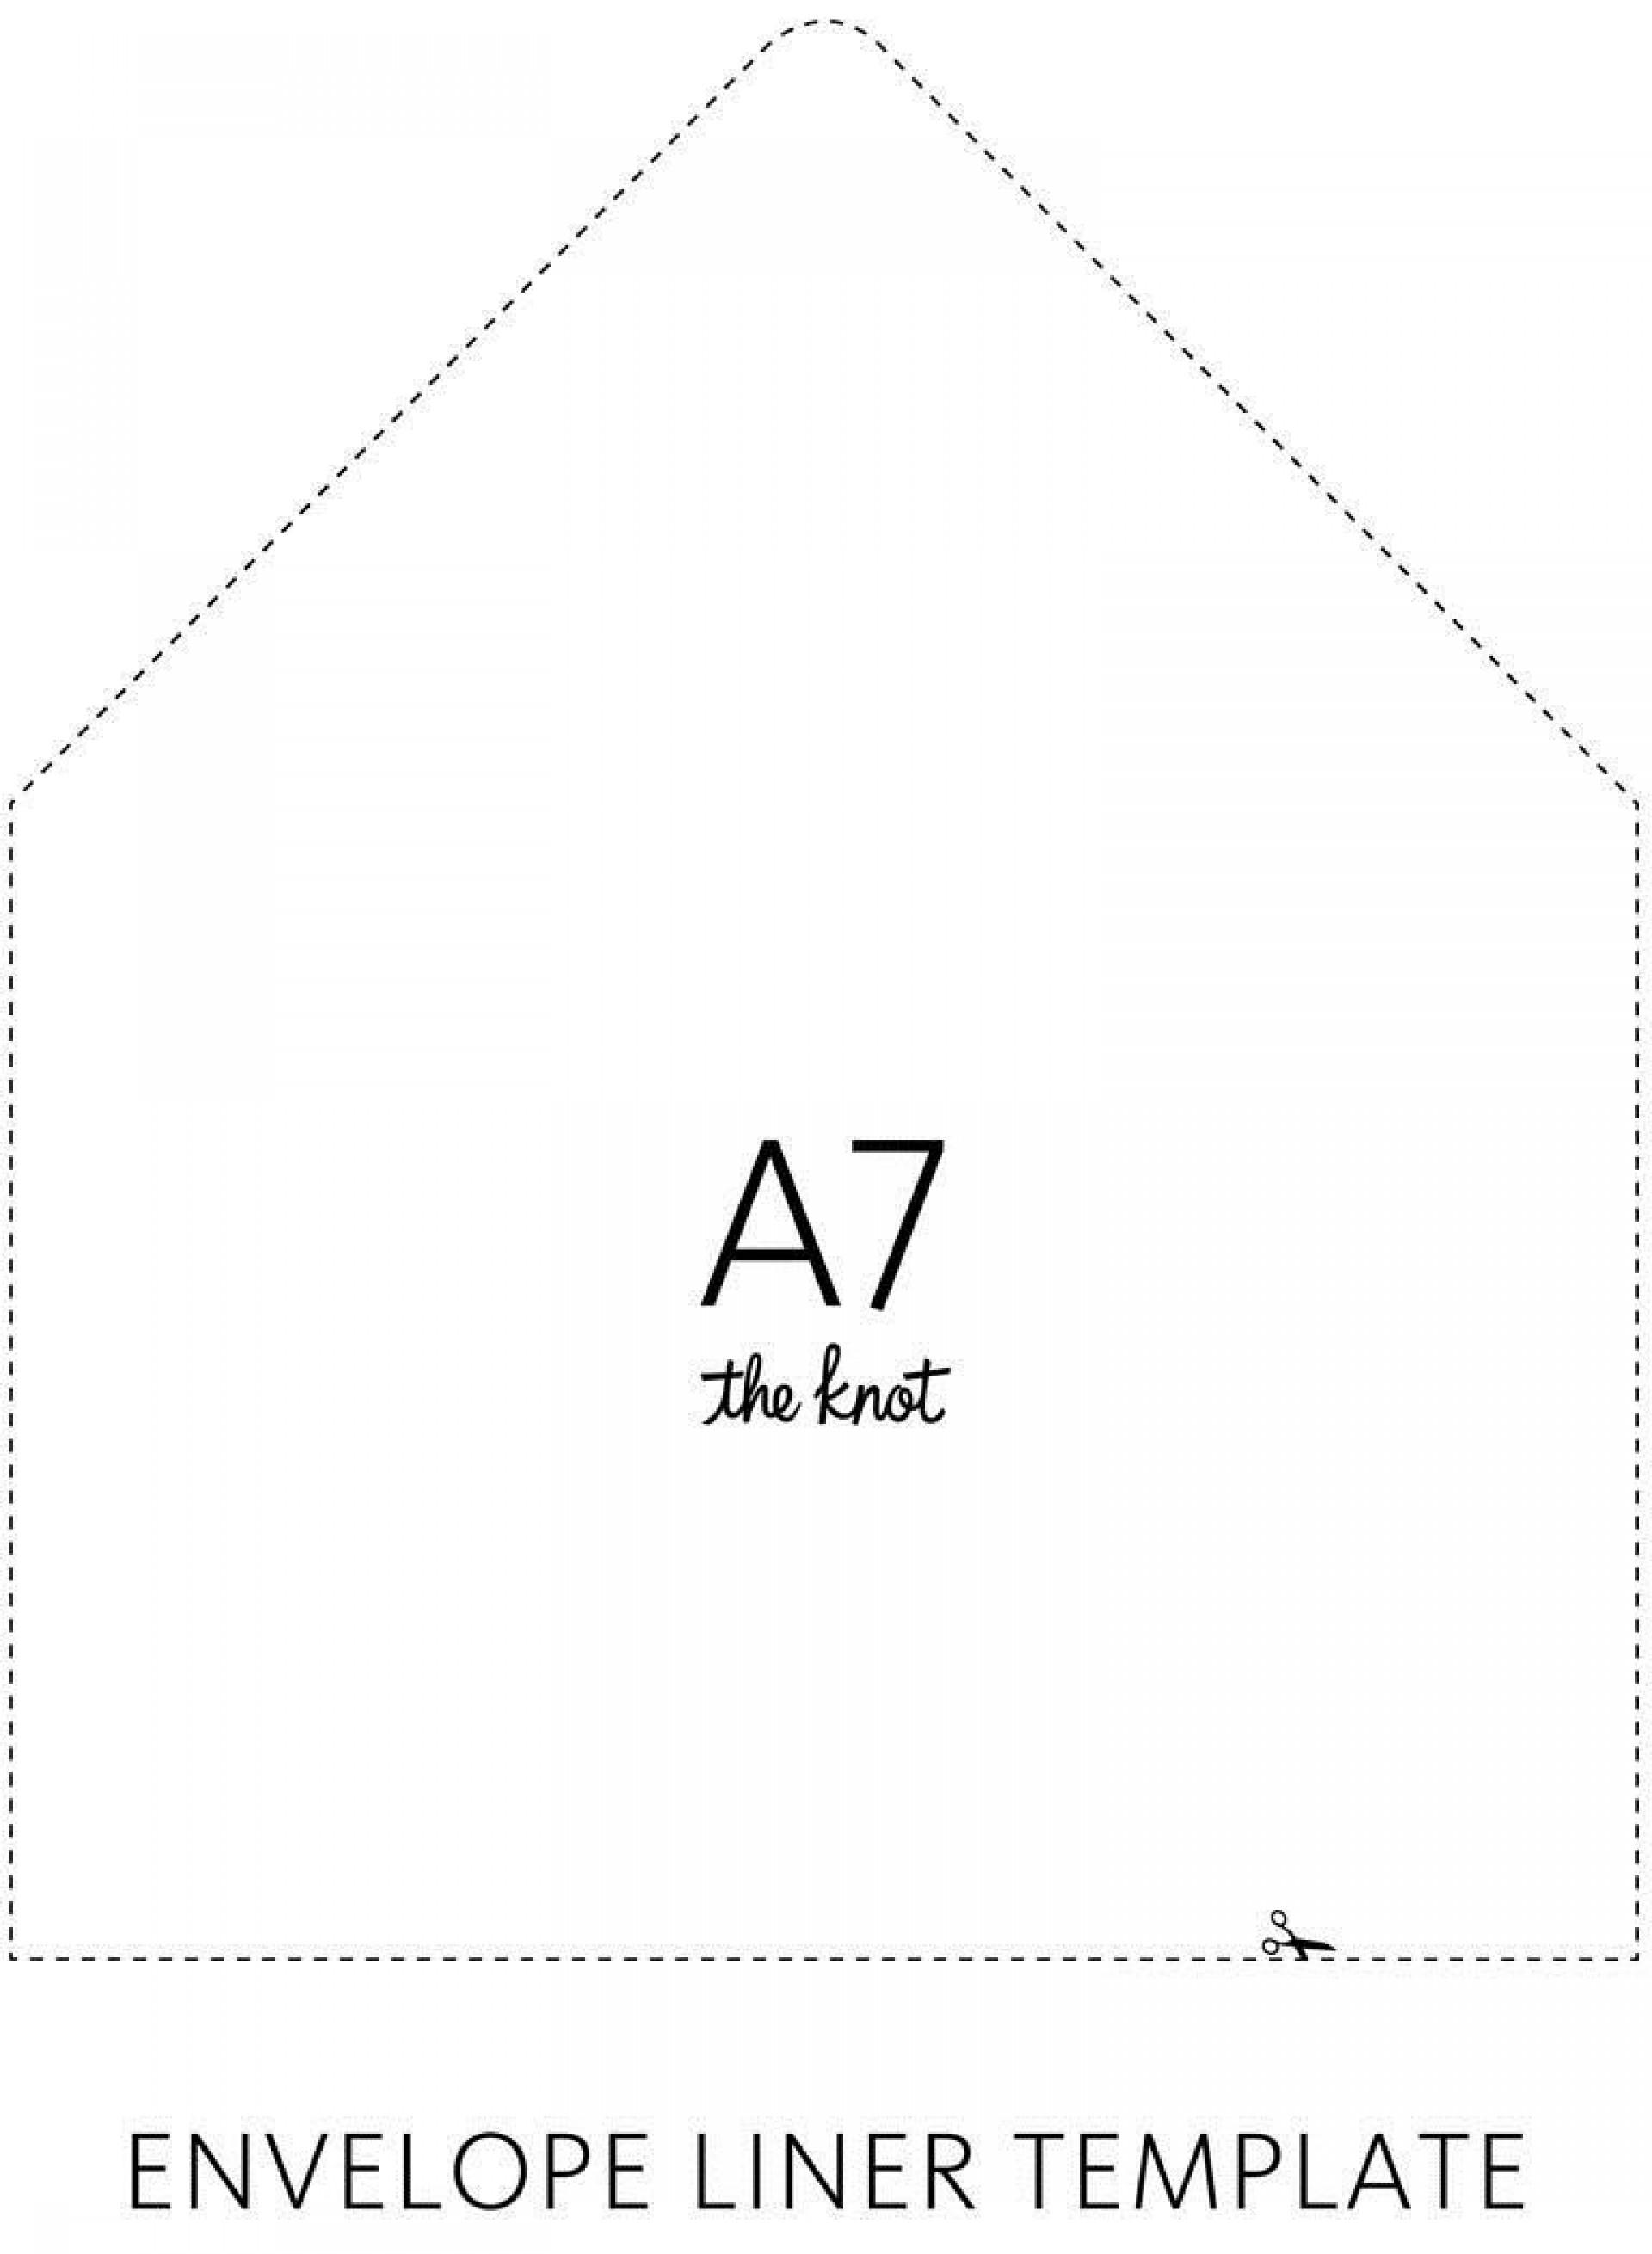 004 Stirring A7 Envelope Liner Template Picture  Printable Illustrator Free1920